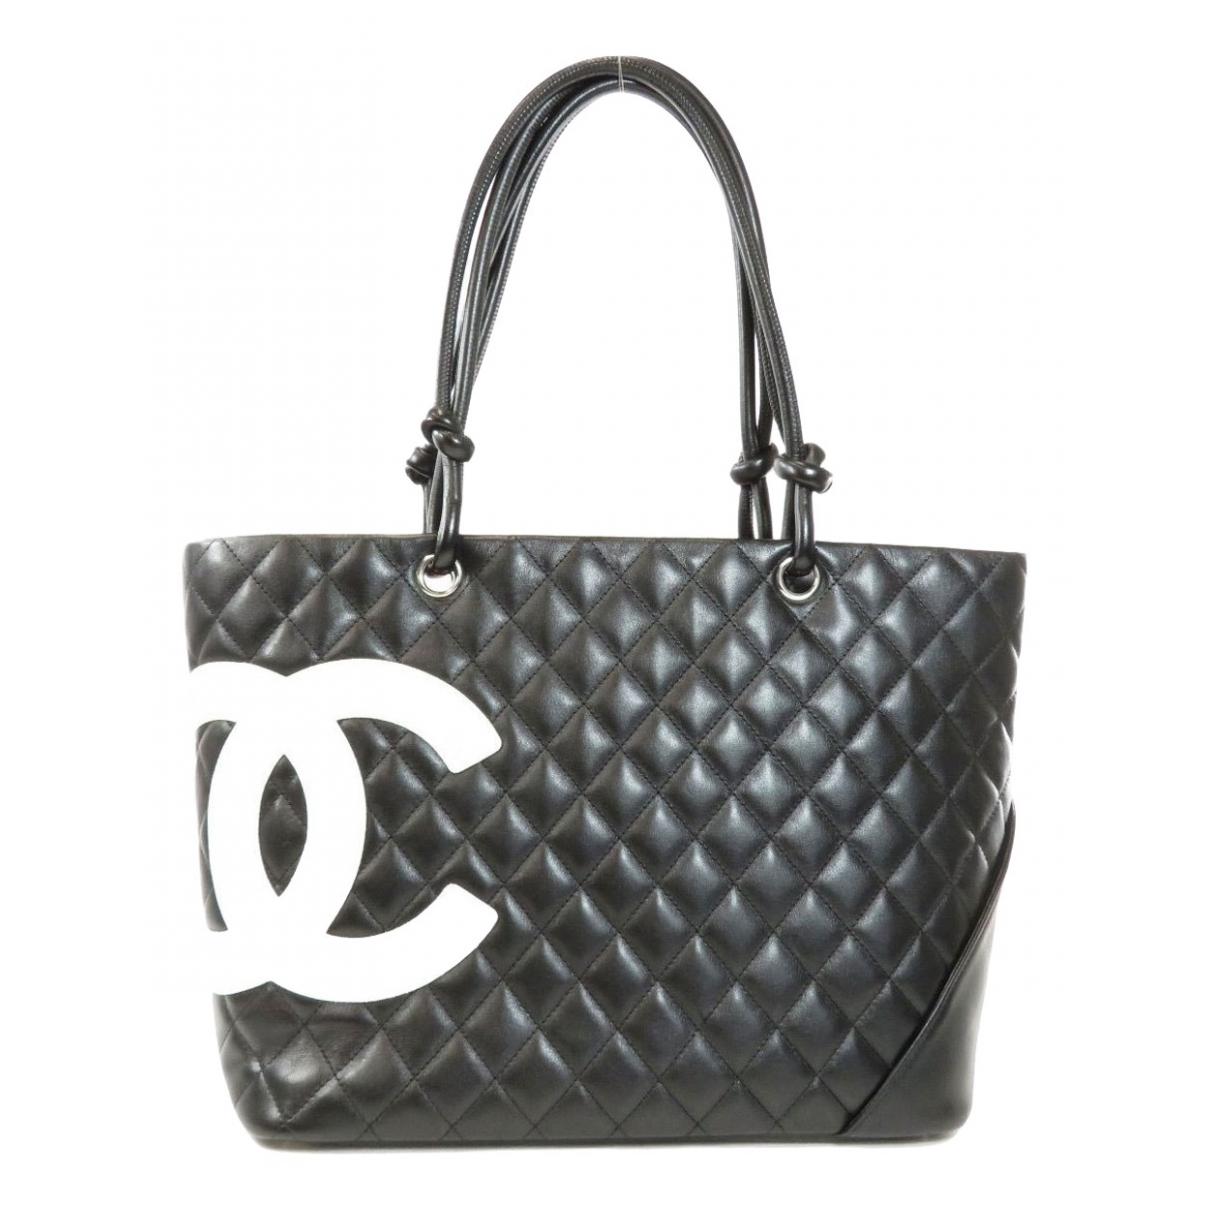 Chanel - Sac a main Cambon pour femme en cuir - noir